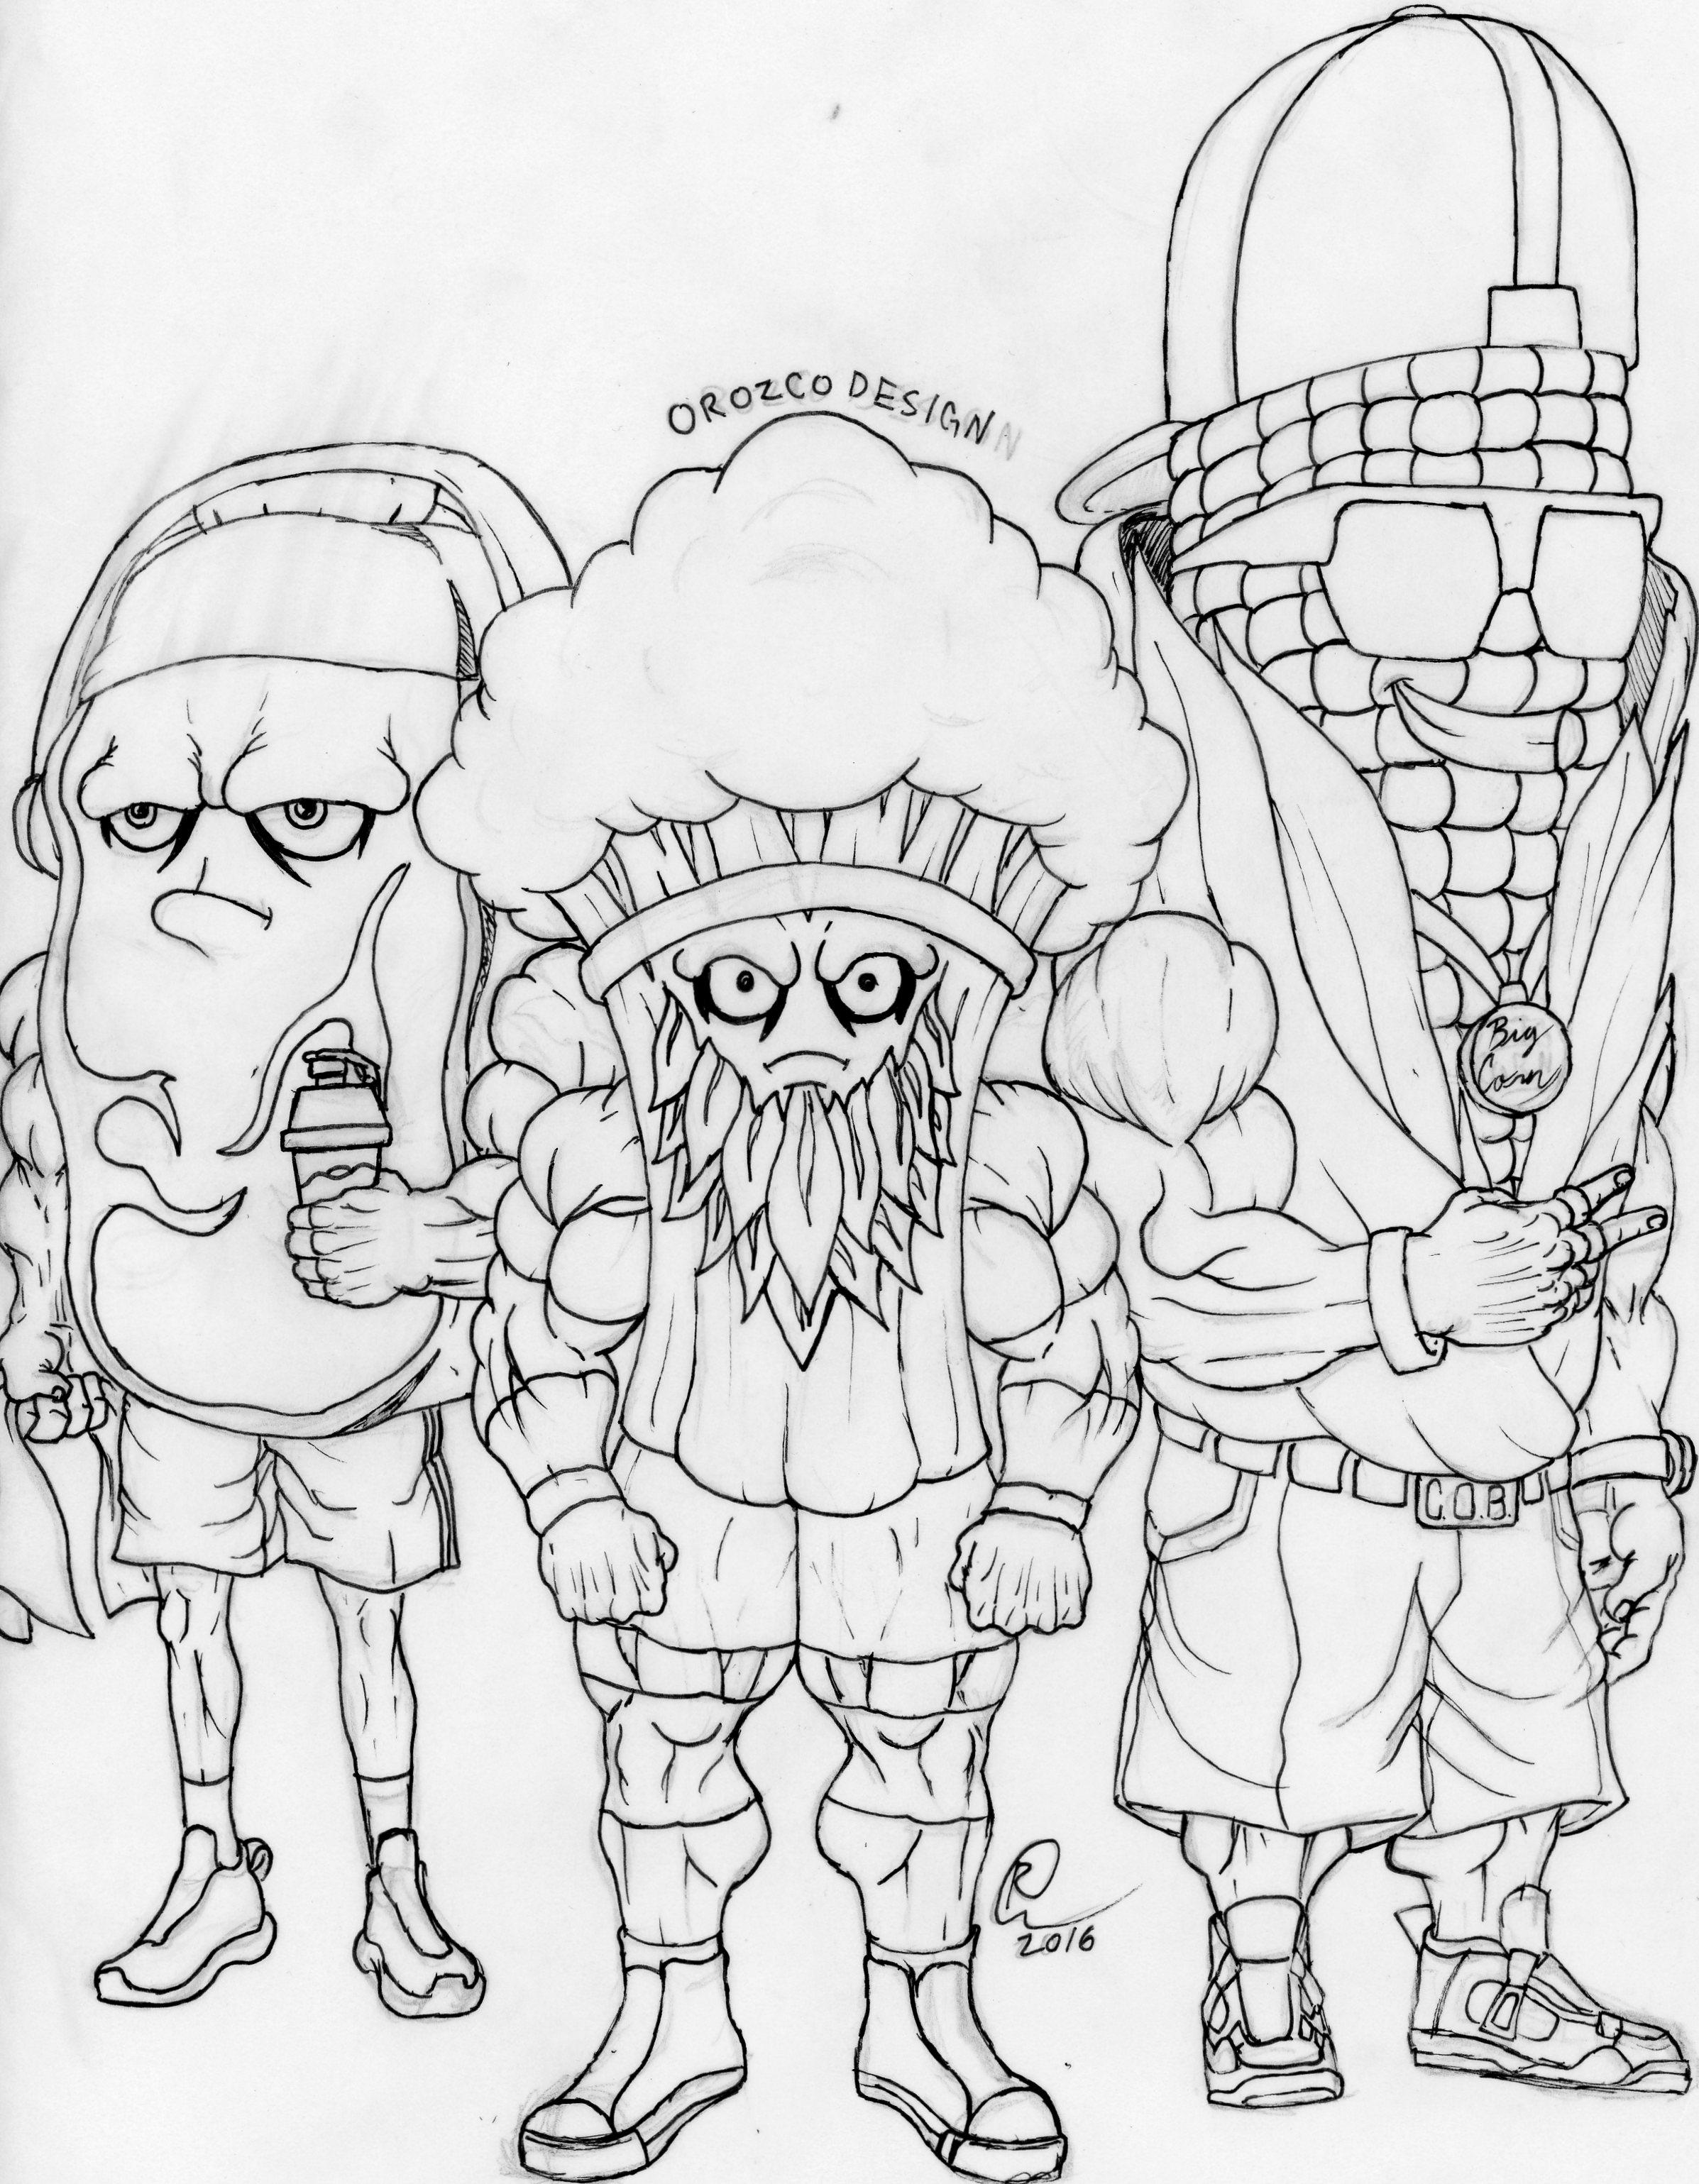 clean-machine-raskol-apparel-omar-isuf-roberto-orozco-artist-designer-illustrator-sketch-drawing-steak-broccoli-corn-illustration-illustrator-hand-drawn-drawing.jpg